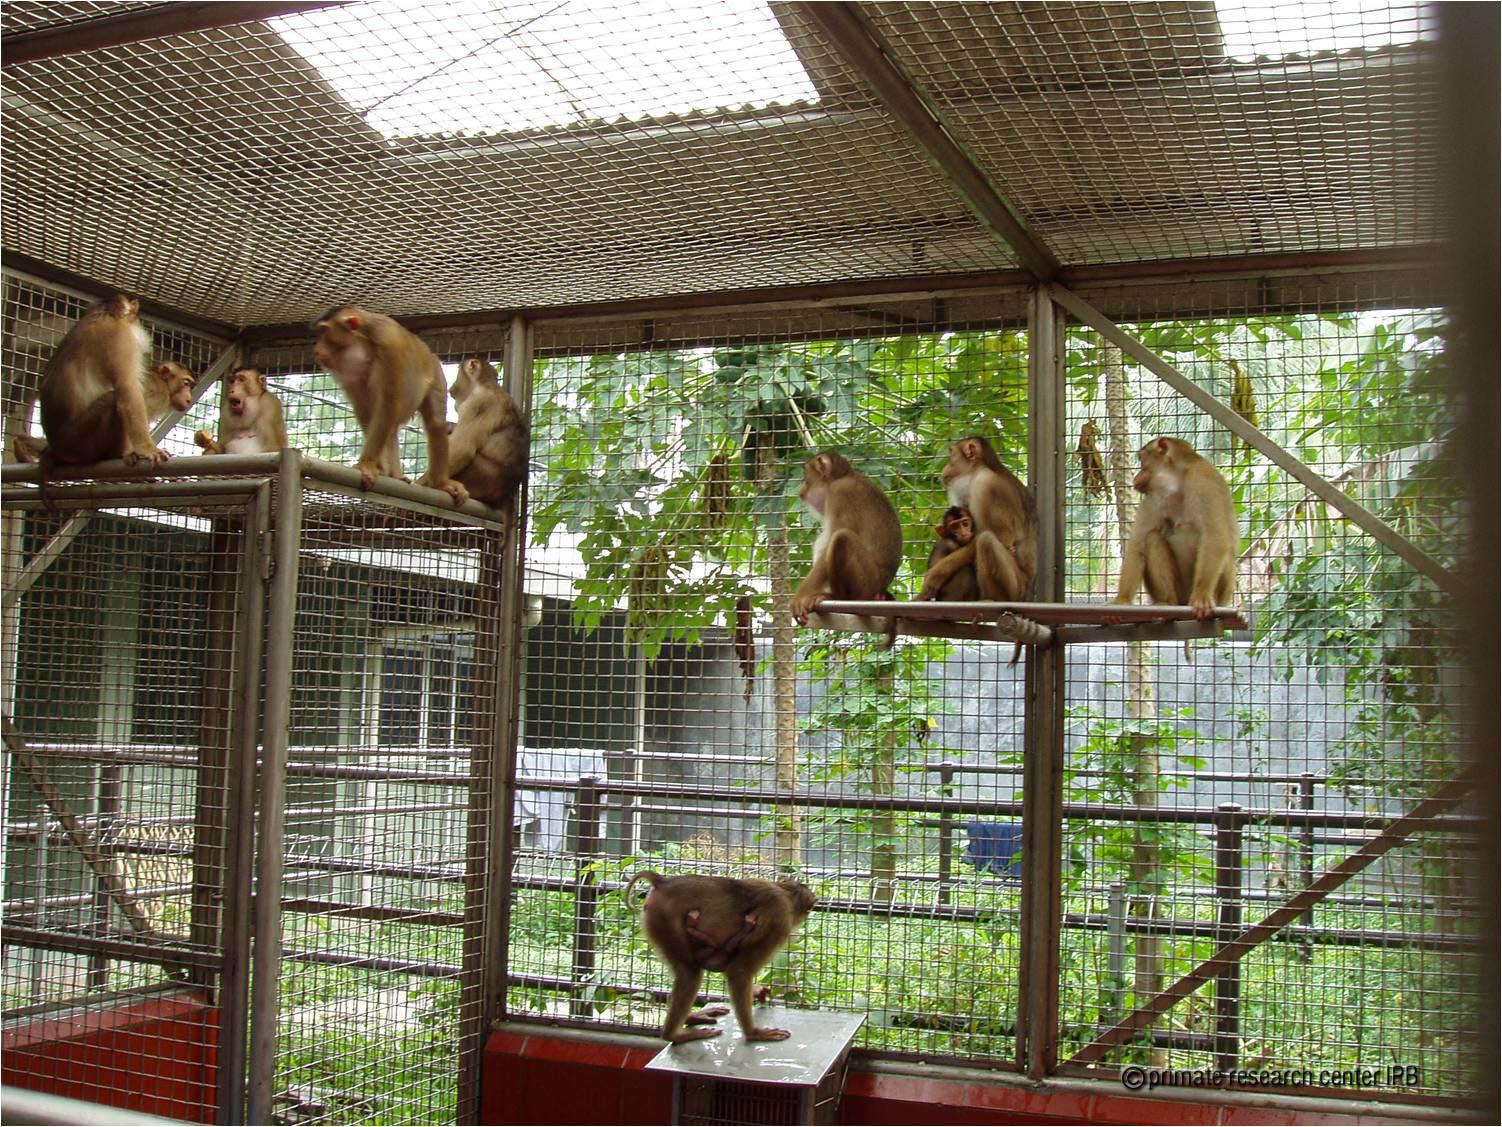 Pusat Studi Satwa Primata IPB University